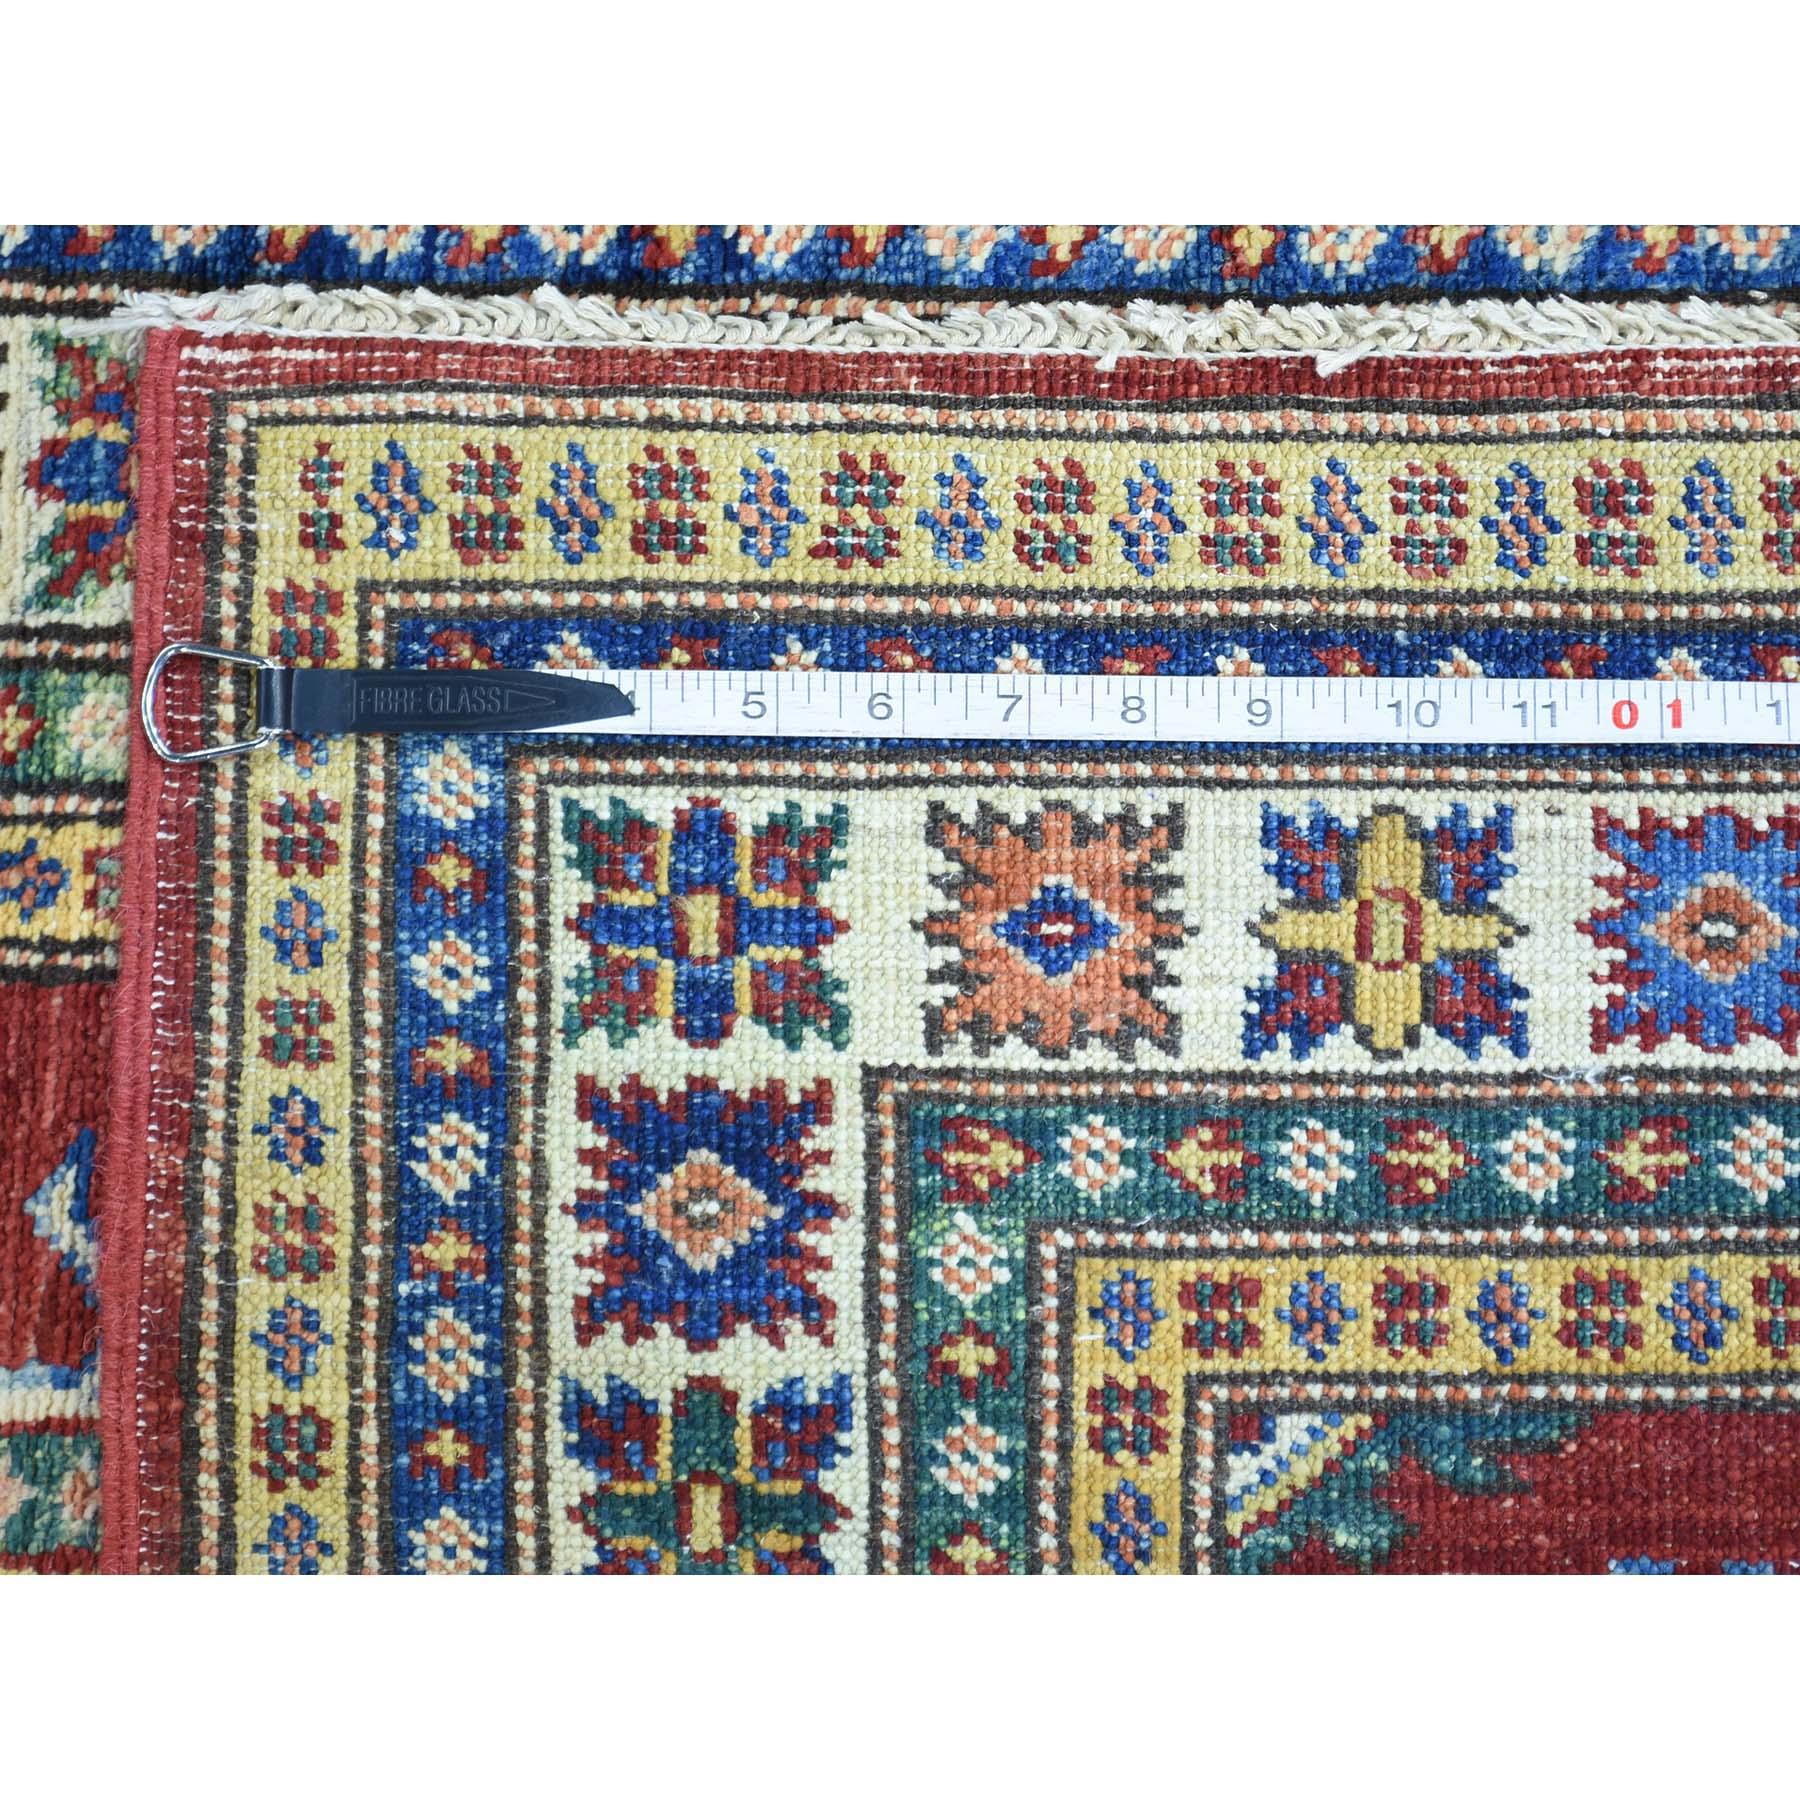 "2'7""x19' Hand-Knotted Tribal Design Super Kazak XL Runner Oriental Rug"